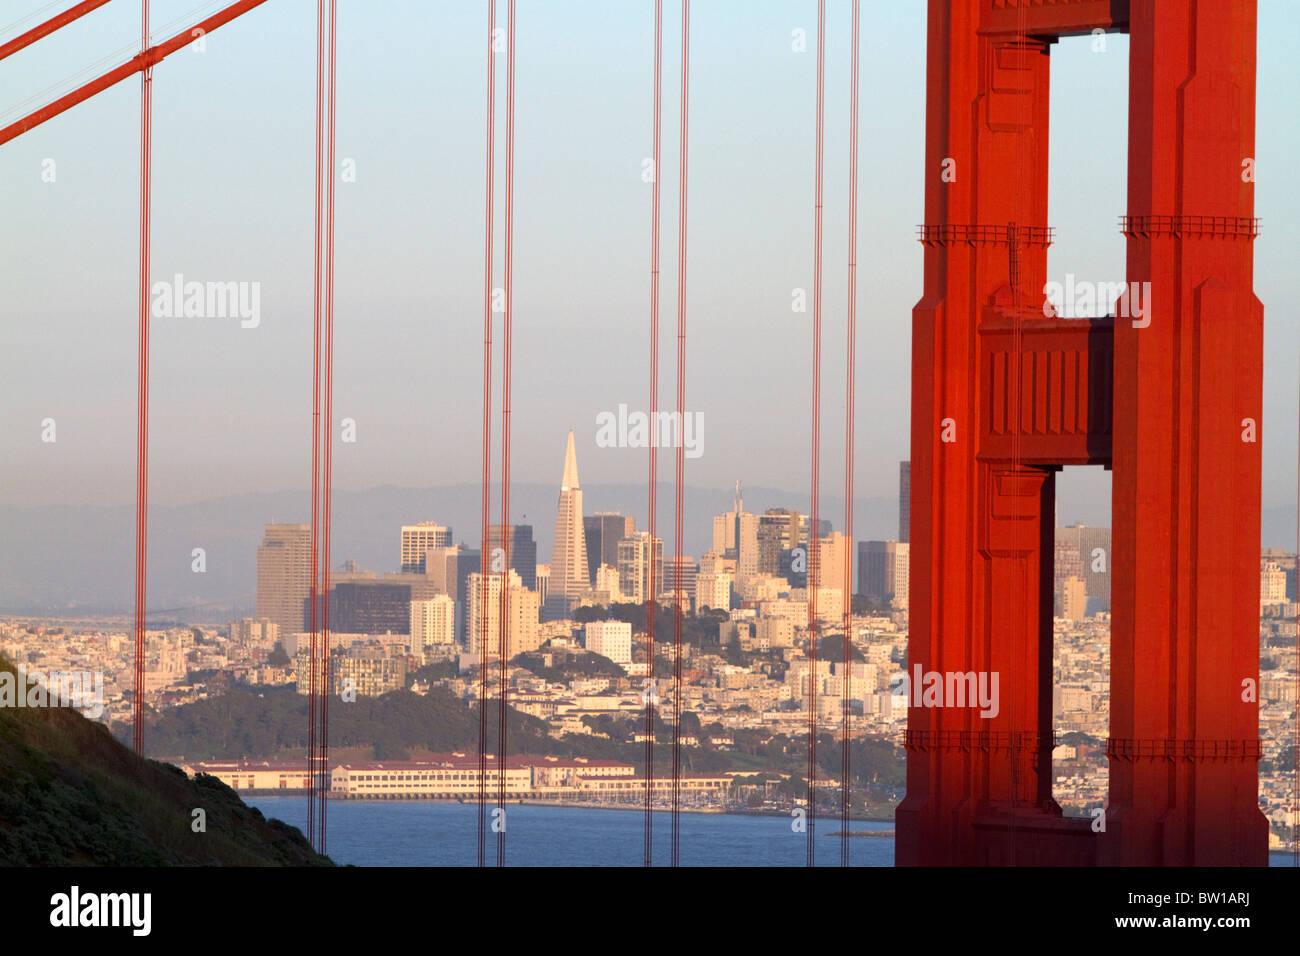 The Golden Gate Bridge and the city of San Francisco, California, USA. - Stock Image